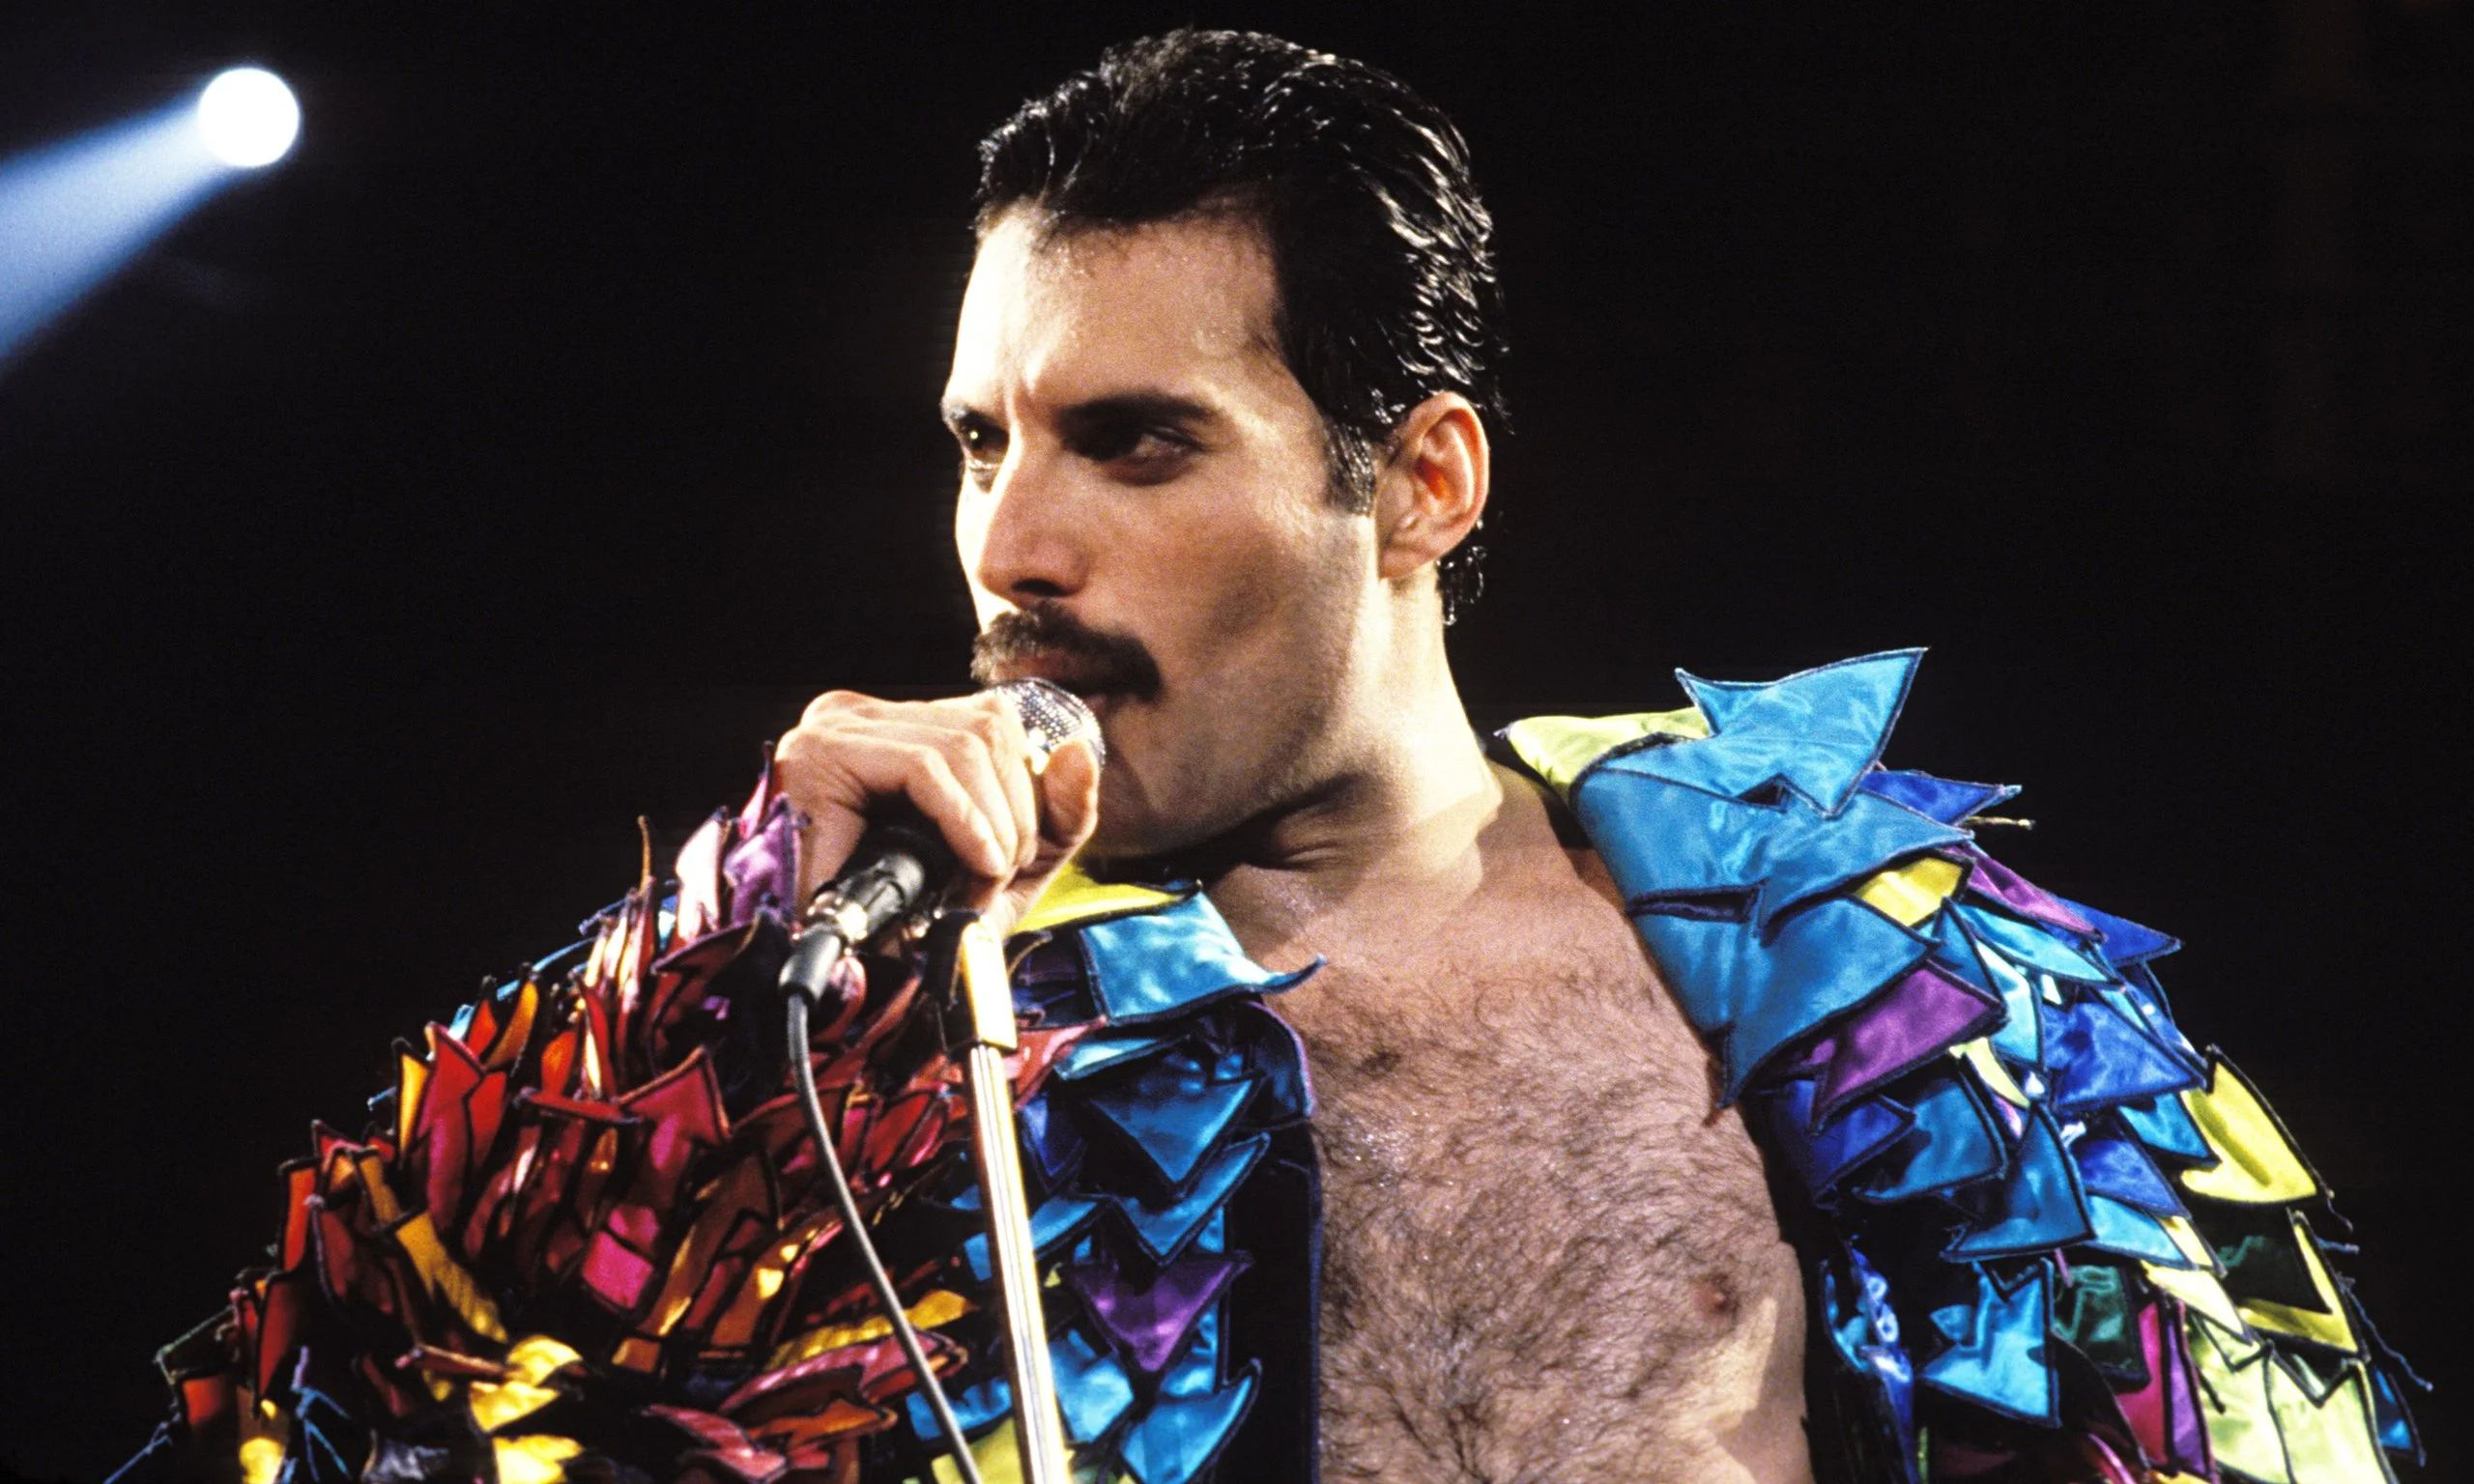 Sacan a la luz grabación inédita de Freddie Mercury que da escalofríos